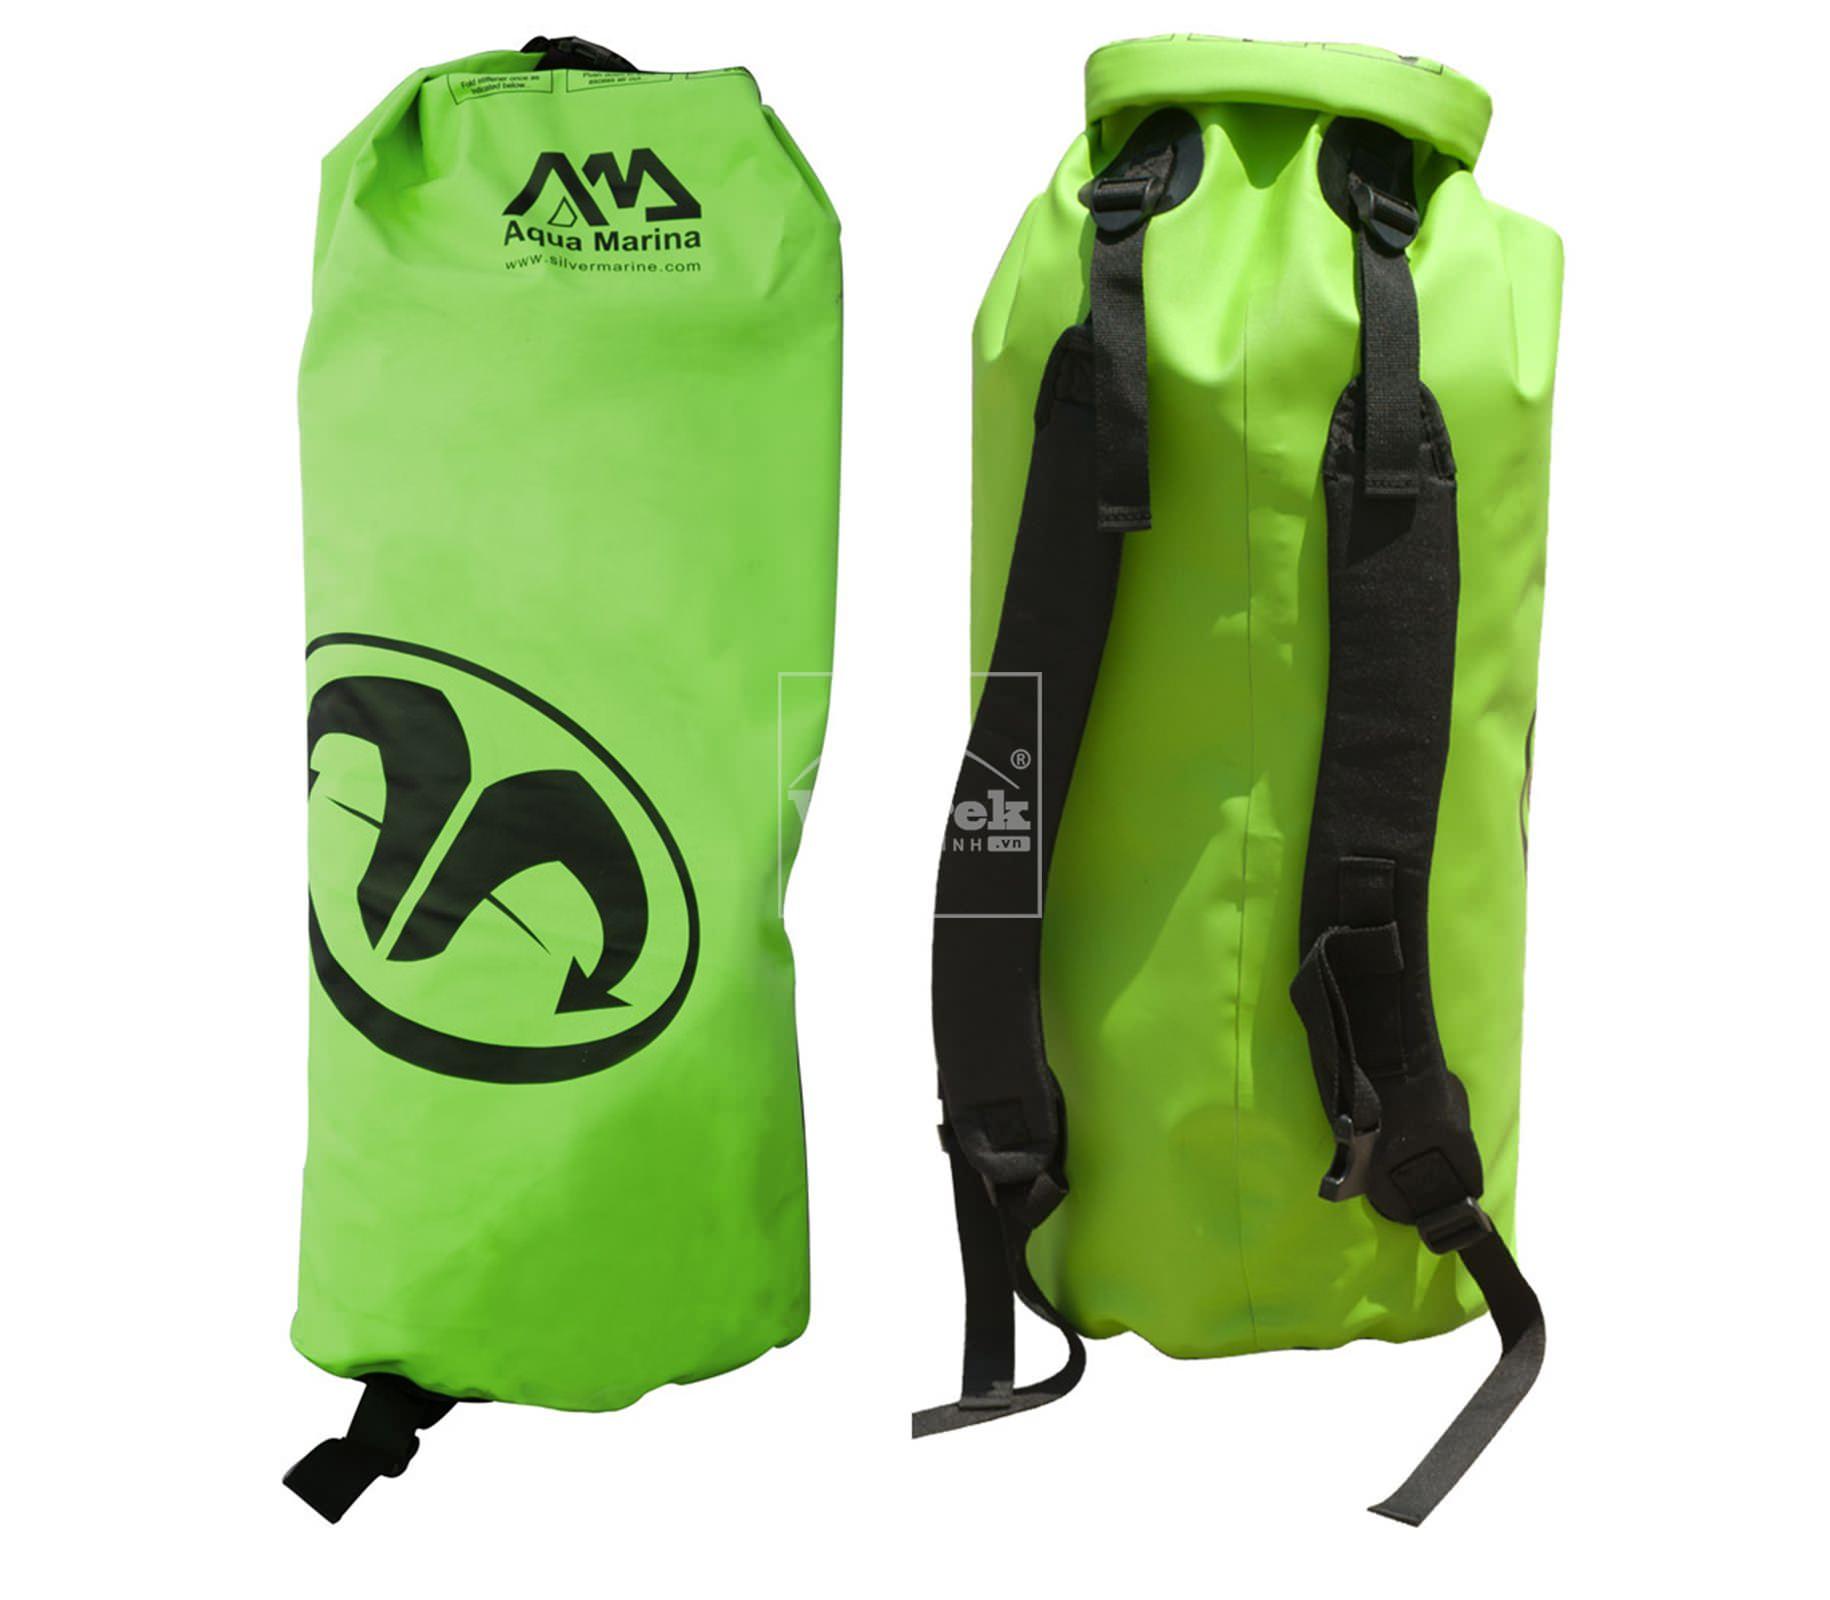 balo-chong-nuoc-aqua-marina-regular-dry-backpack-25l-wetrek.vn-2